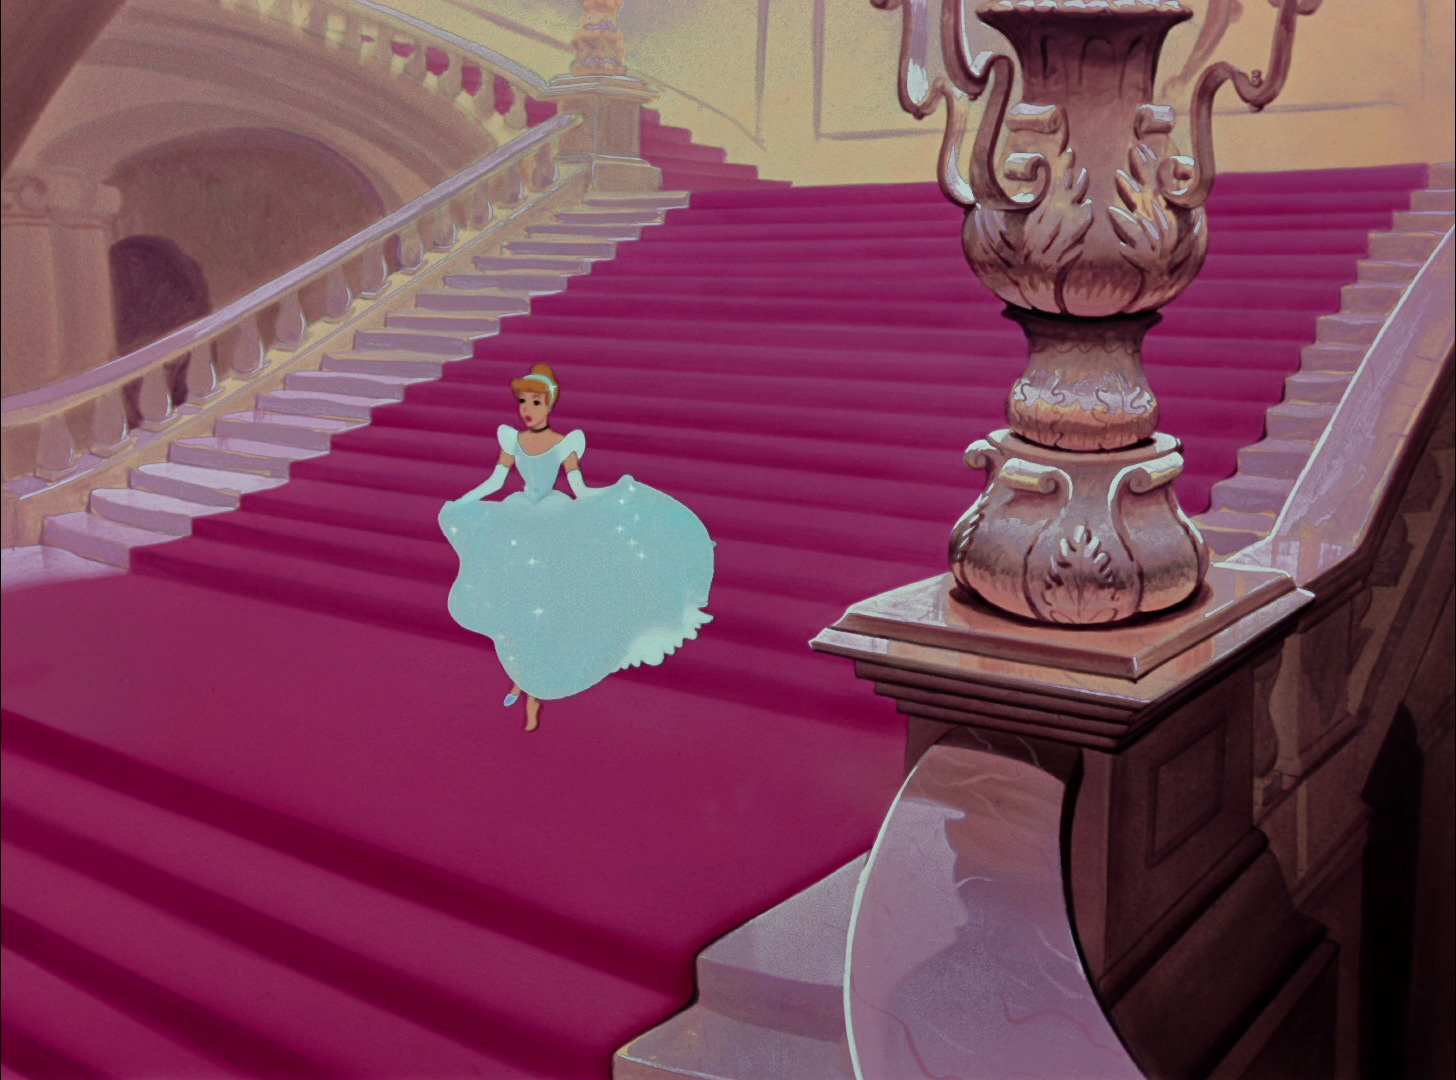 Cinderella-disneyscreencaps.com-6374.jpg